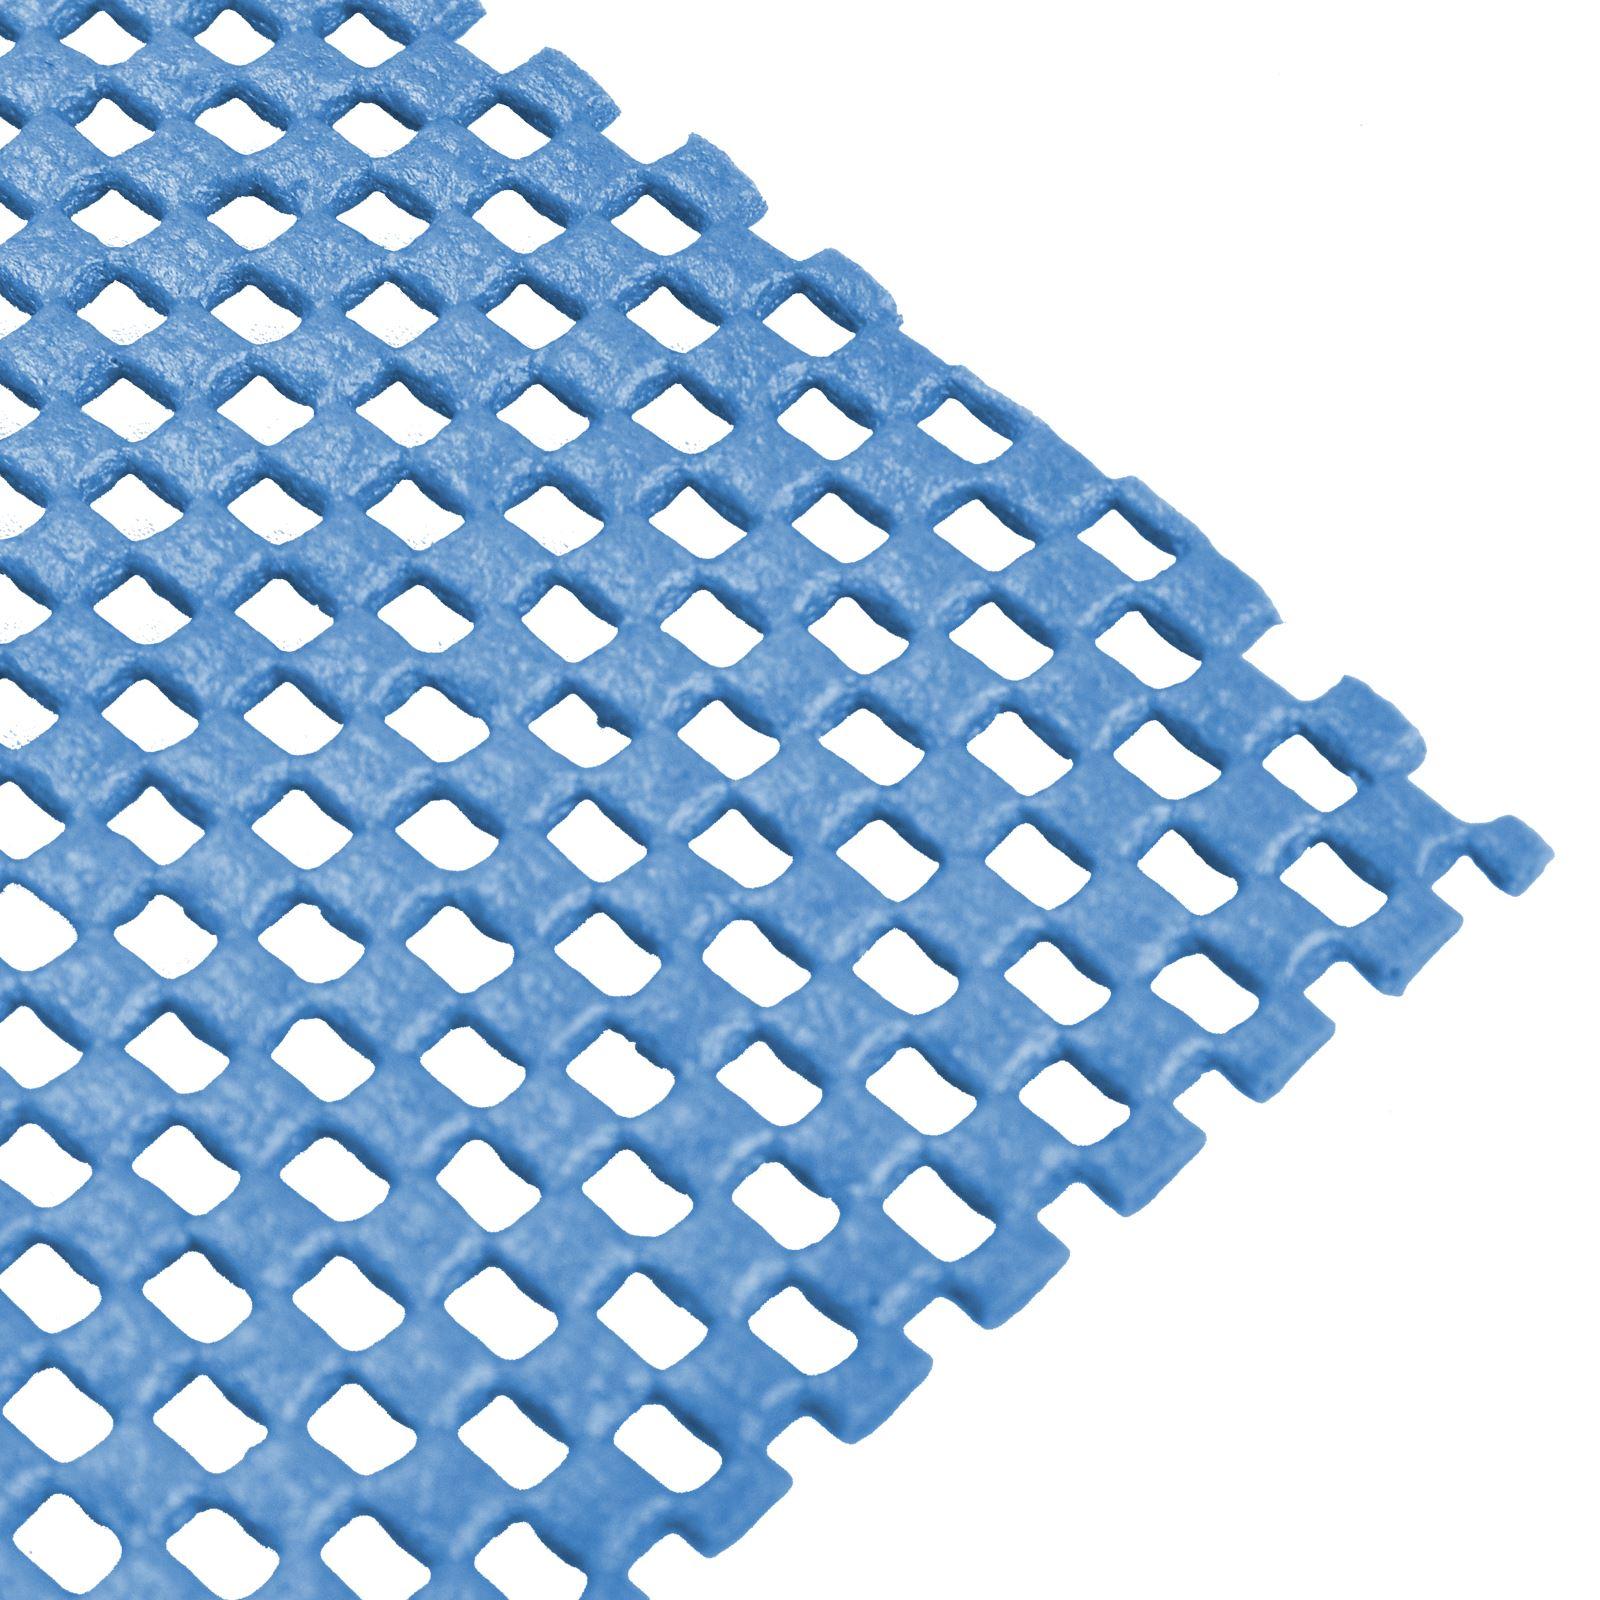 Multi-Purpose-Anti-Non-Slip-Rubber-Mat-Drawer-Liner-Flooring-Gripper-Carpet-Rug thumbnail 4